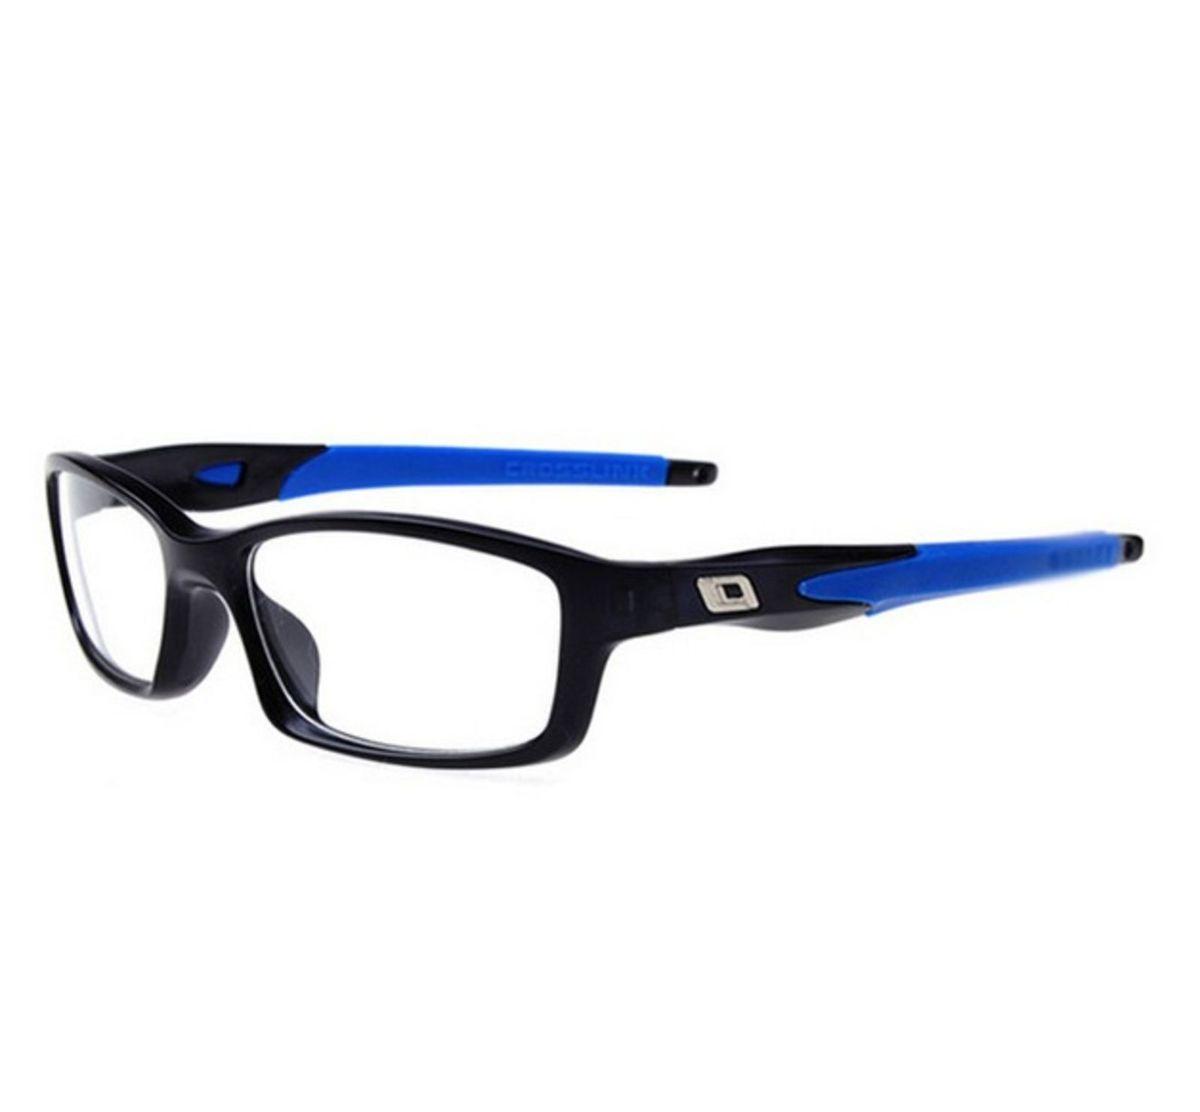 armação óculos sport - óculos otto store.  Czm6ly9wag90b3muzw5qb2vplmnvbs5ici9wcm9kdwn0cy82odm5otkvnwjhnwnjmza5otkynjzlndi0mdy2yjhizdm0mmrmmzmuanbn  ... cce6d956cb